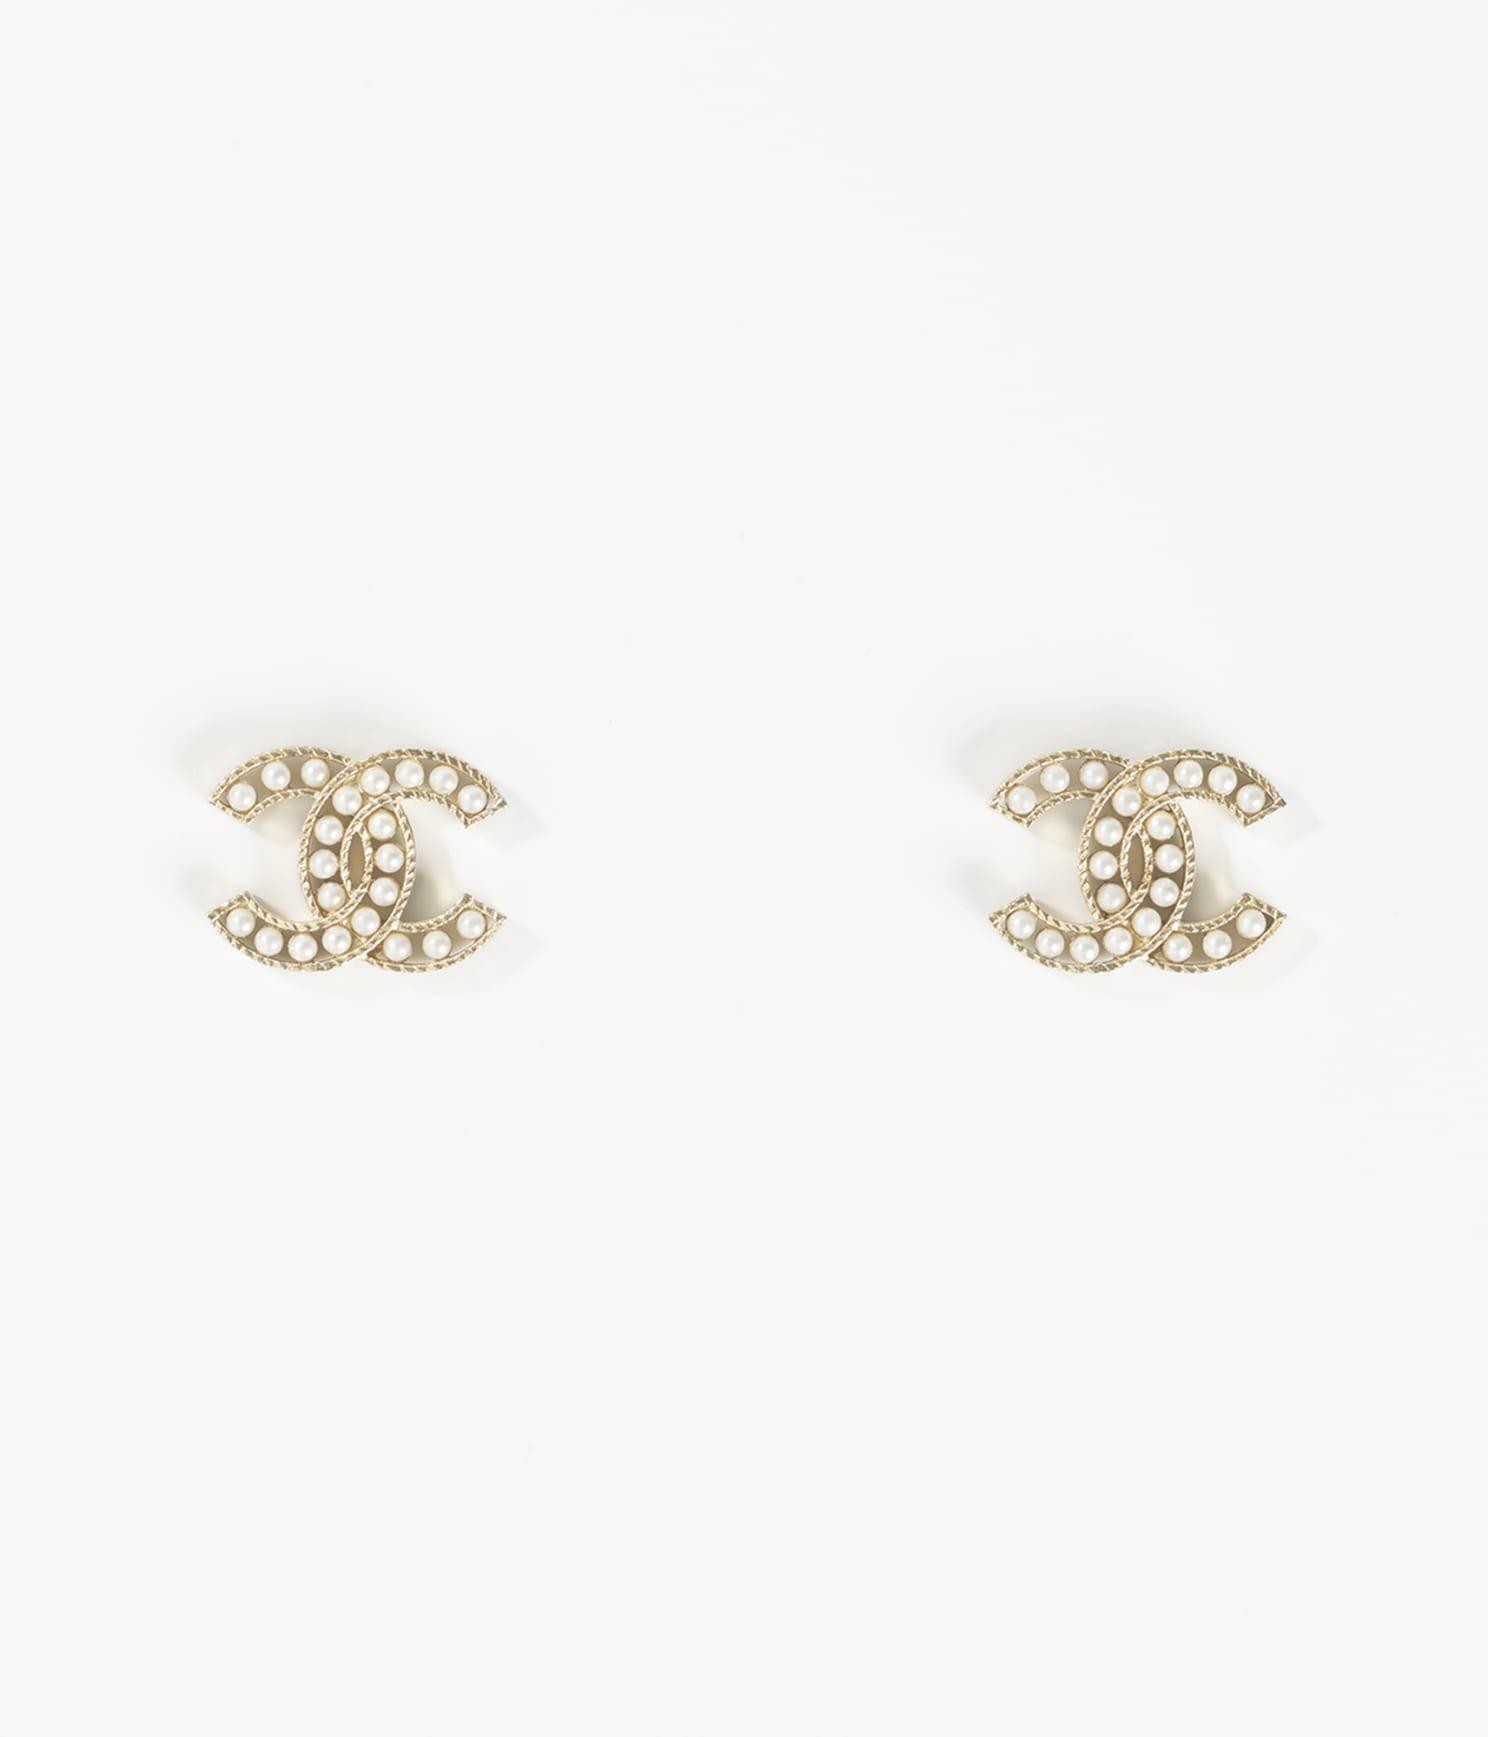 CHANEL 金屬琉璃珠耳環,建議售價 NT$13,100